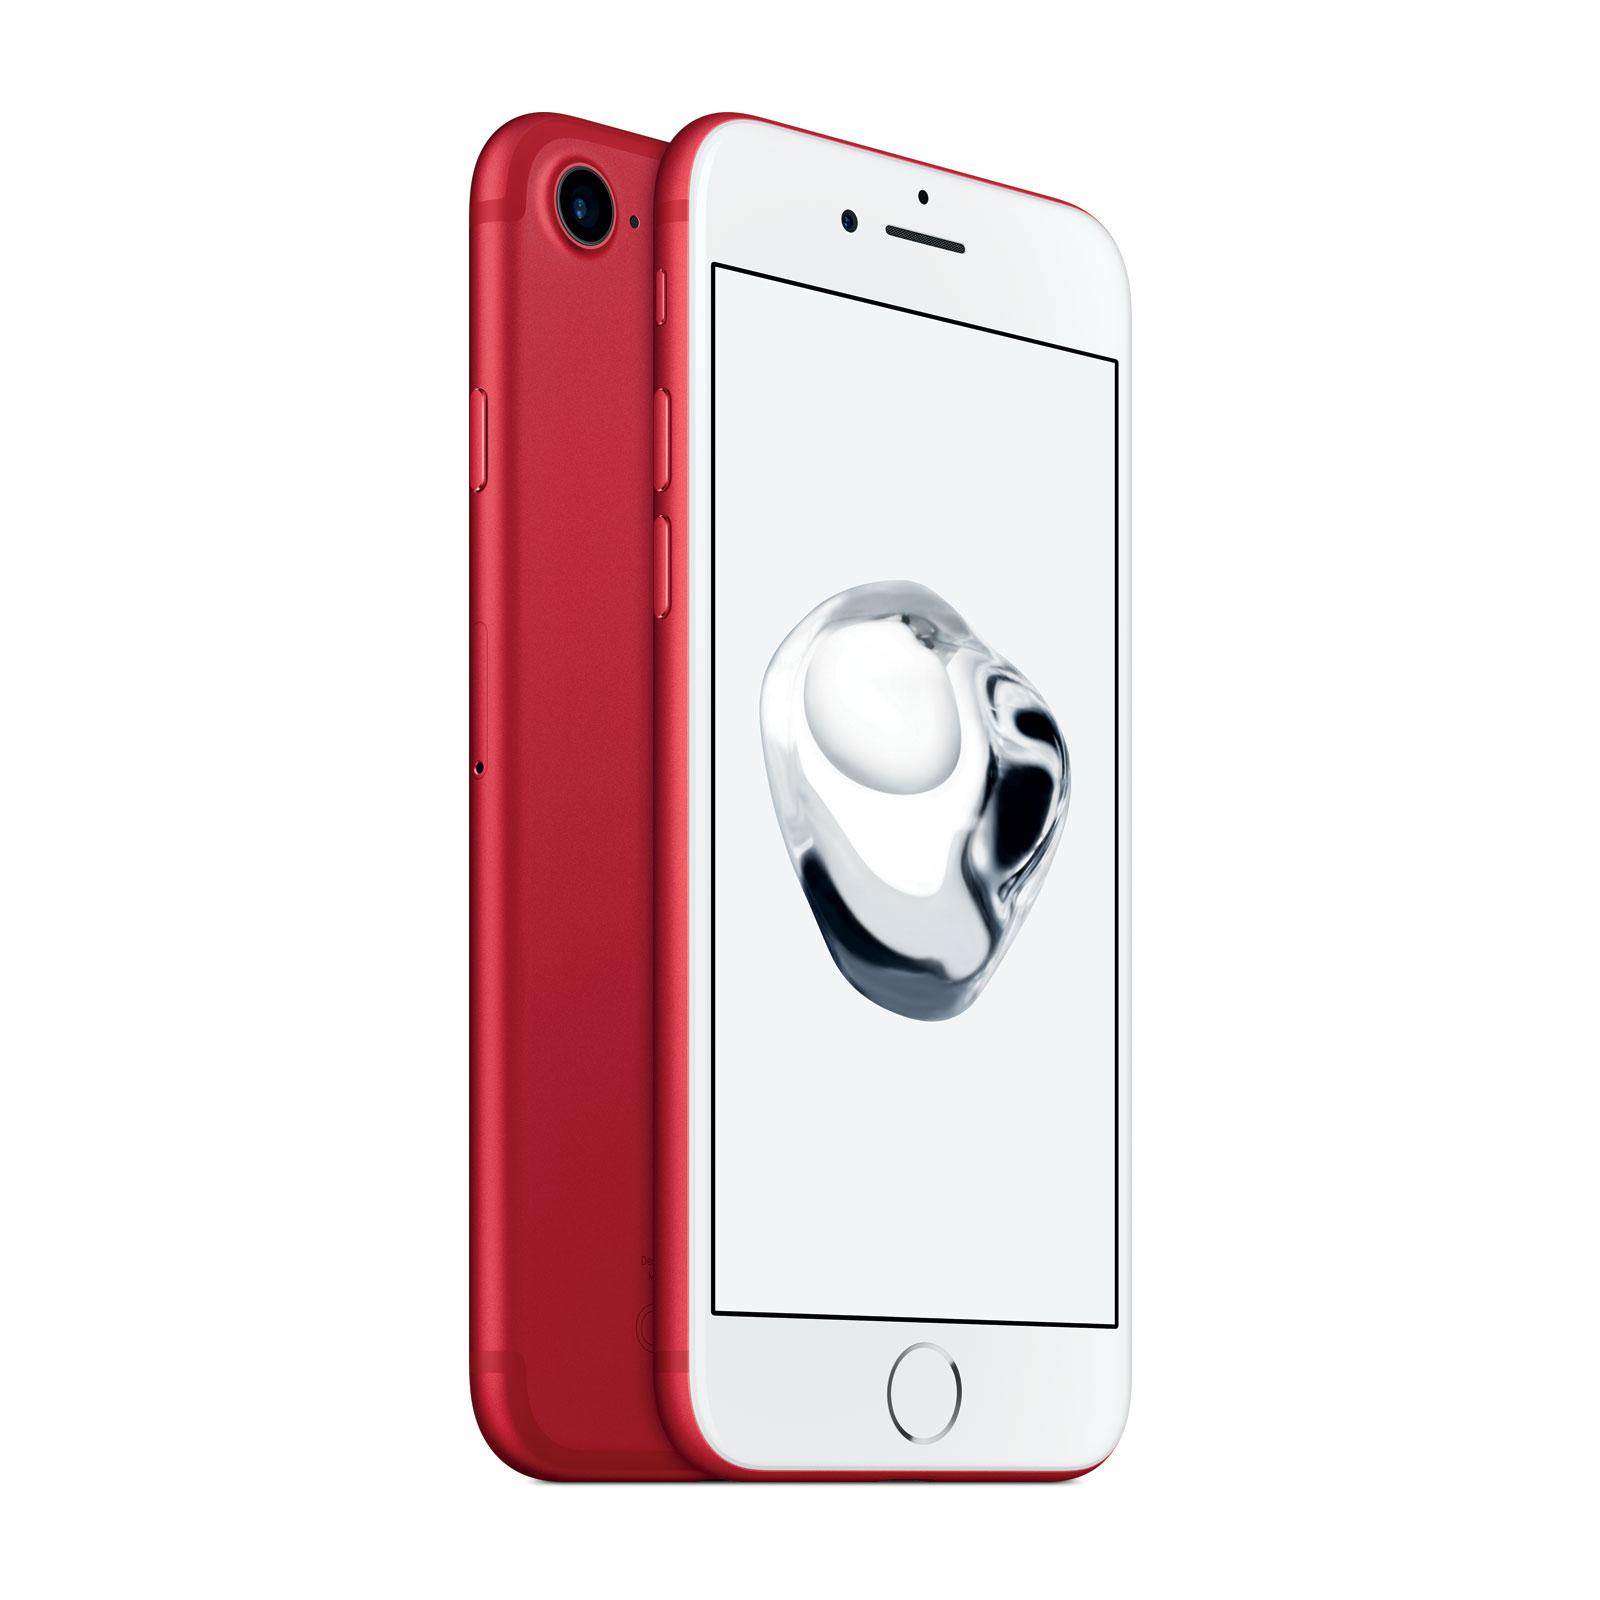 apple iphone 7 256 go rouge special edition mobile smartphone apple sur. Black Bedroom Furniture Sets. Home Design Ideas